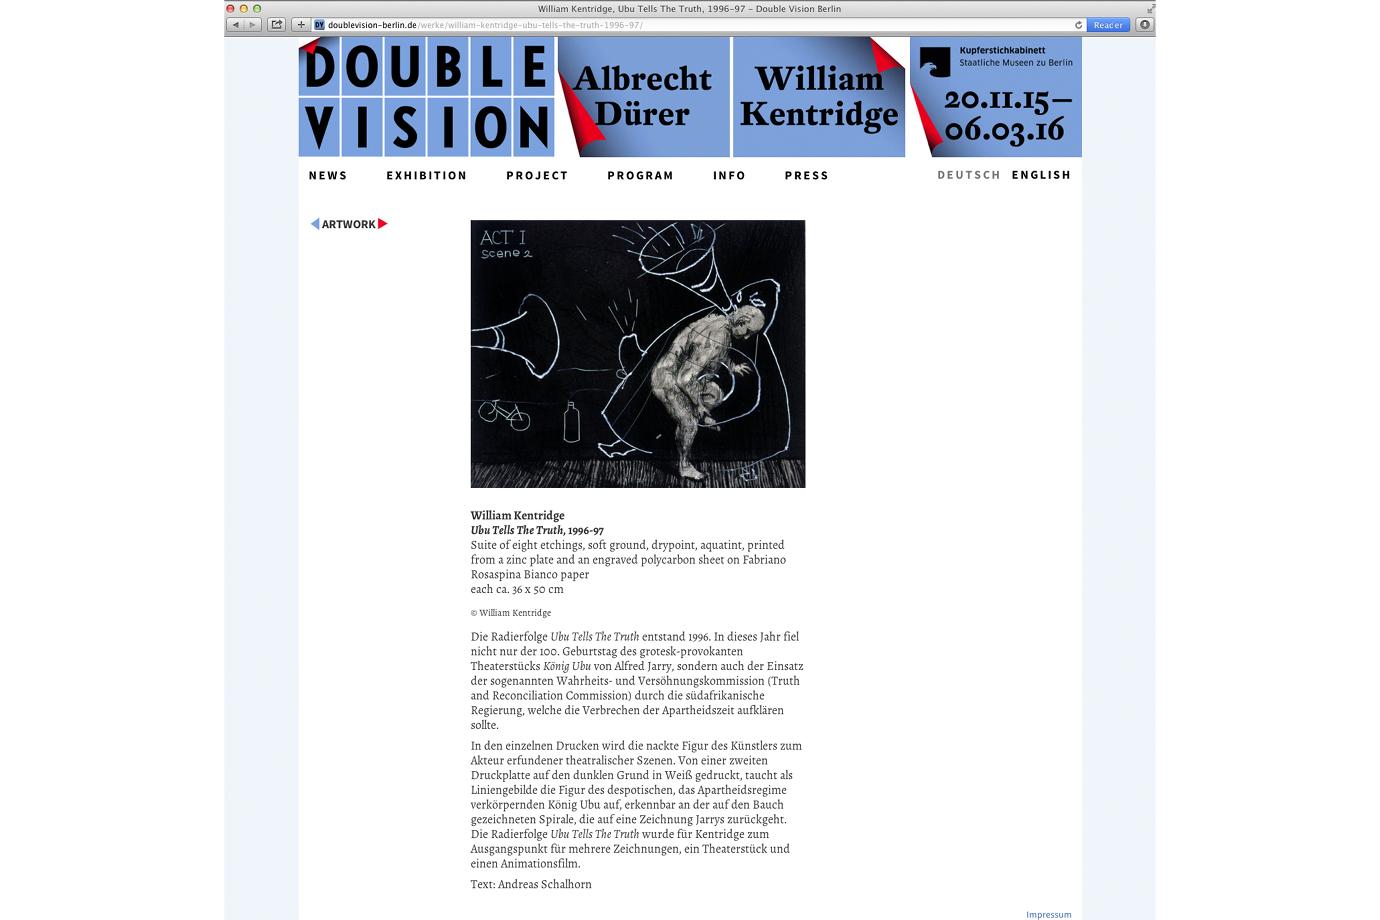 http://e-o-t.de/wordpress/wp-content/uploads/2017/11/2014_eot-DoubleVision-Web-02.jpg